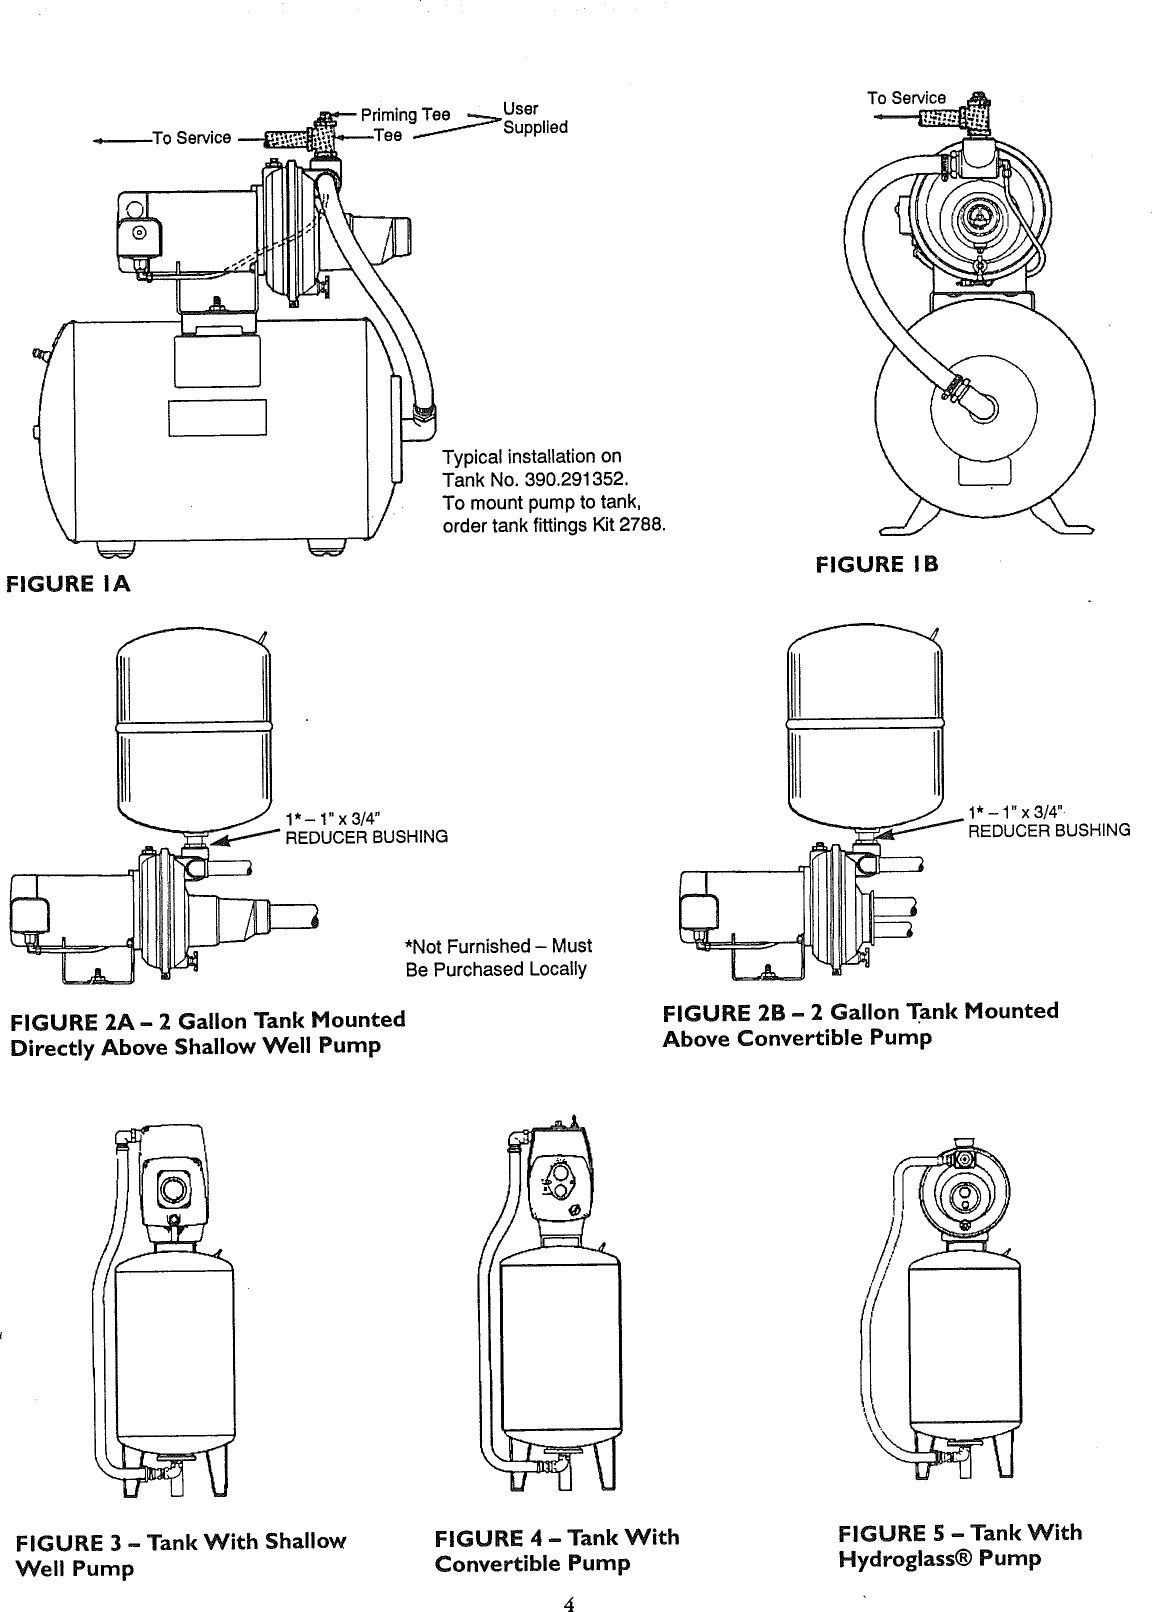 Craftsman 390291352 User Manual CAPTIVE AIR TANK Manuals